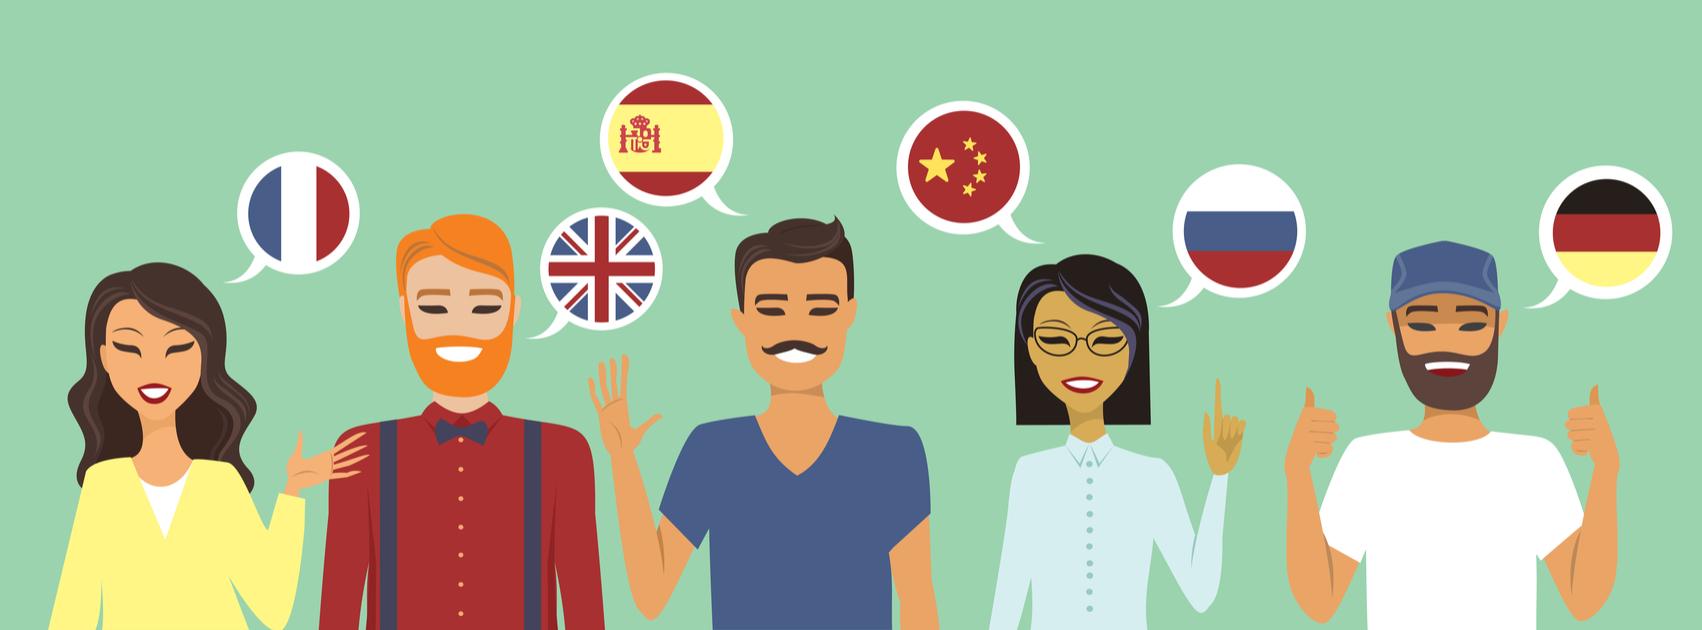 traduzioni multilingua